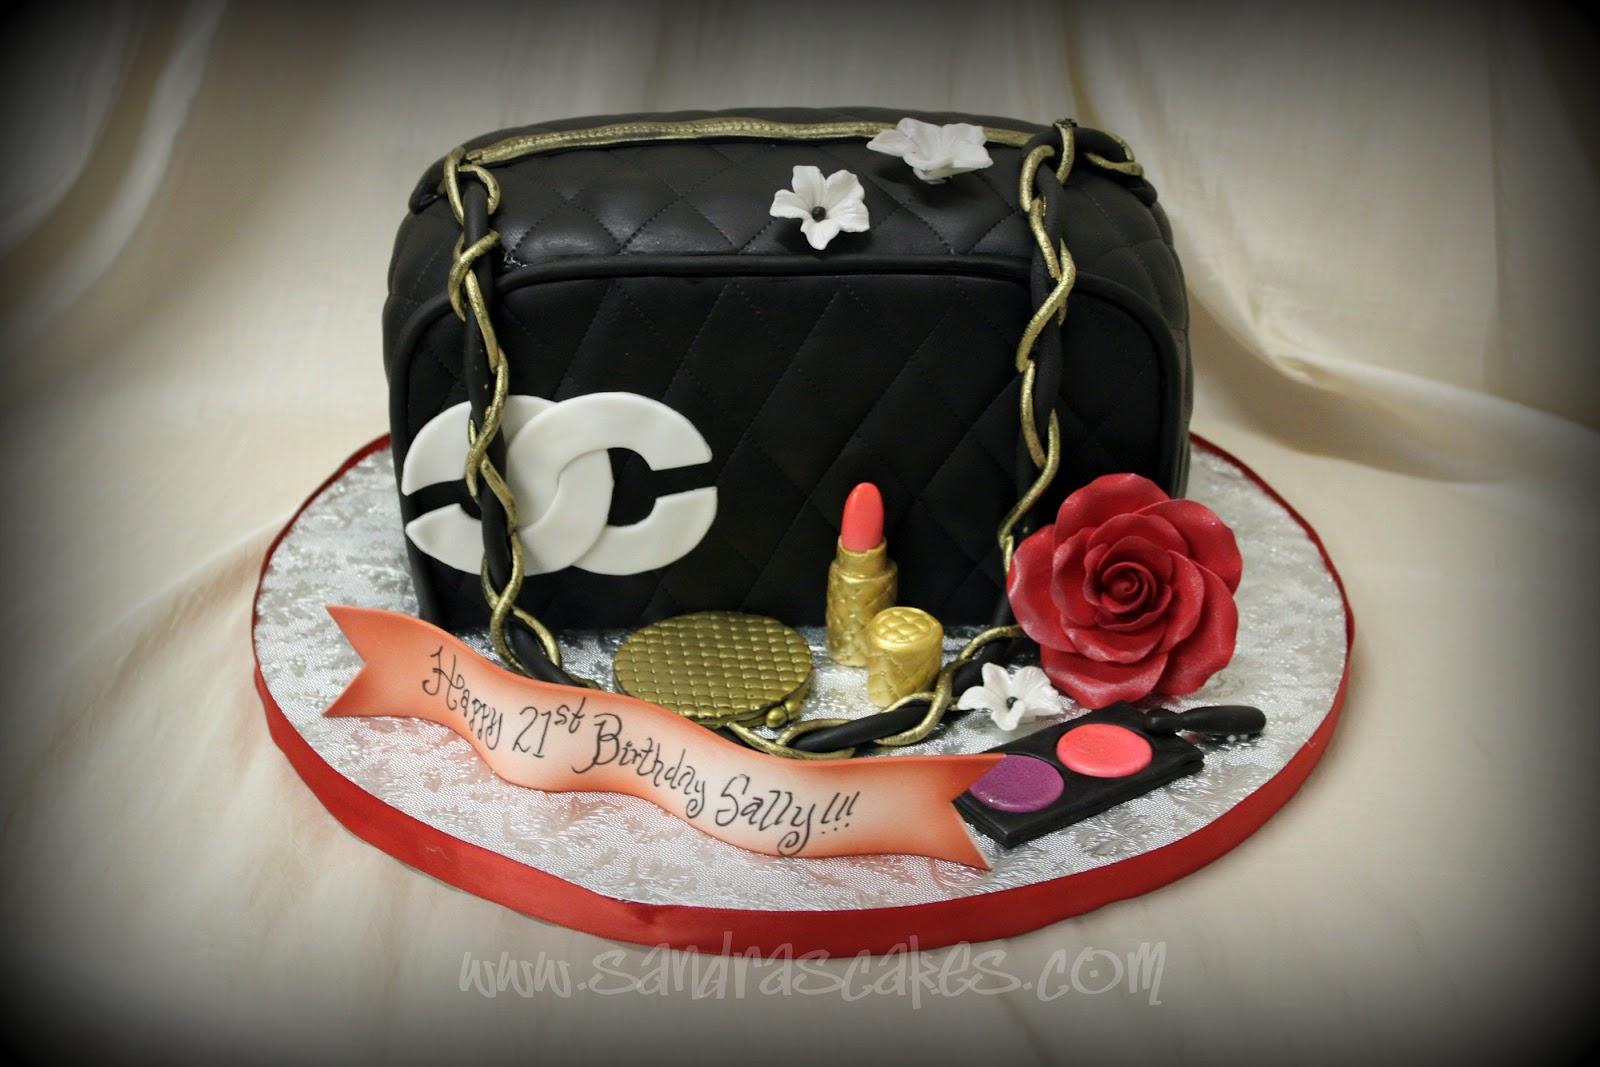 On Birthday Cakes Channel Handbag Cake